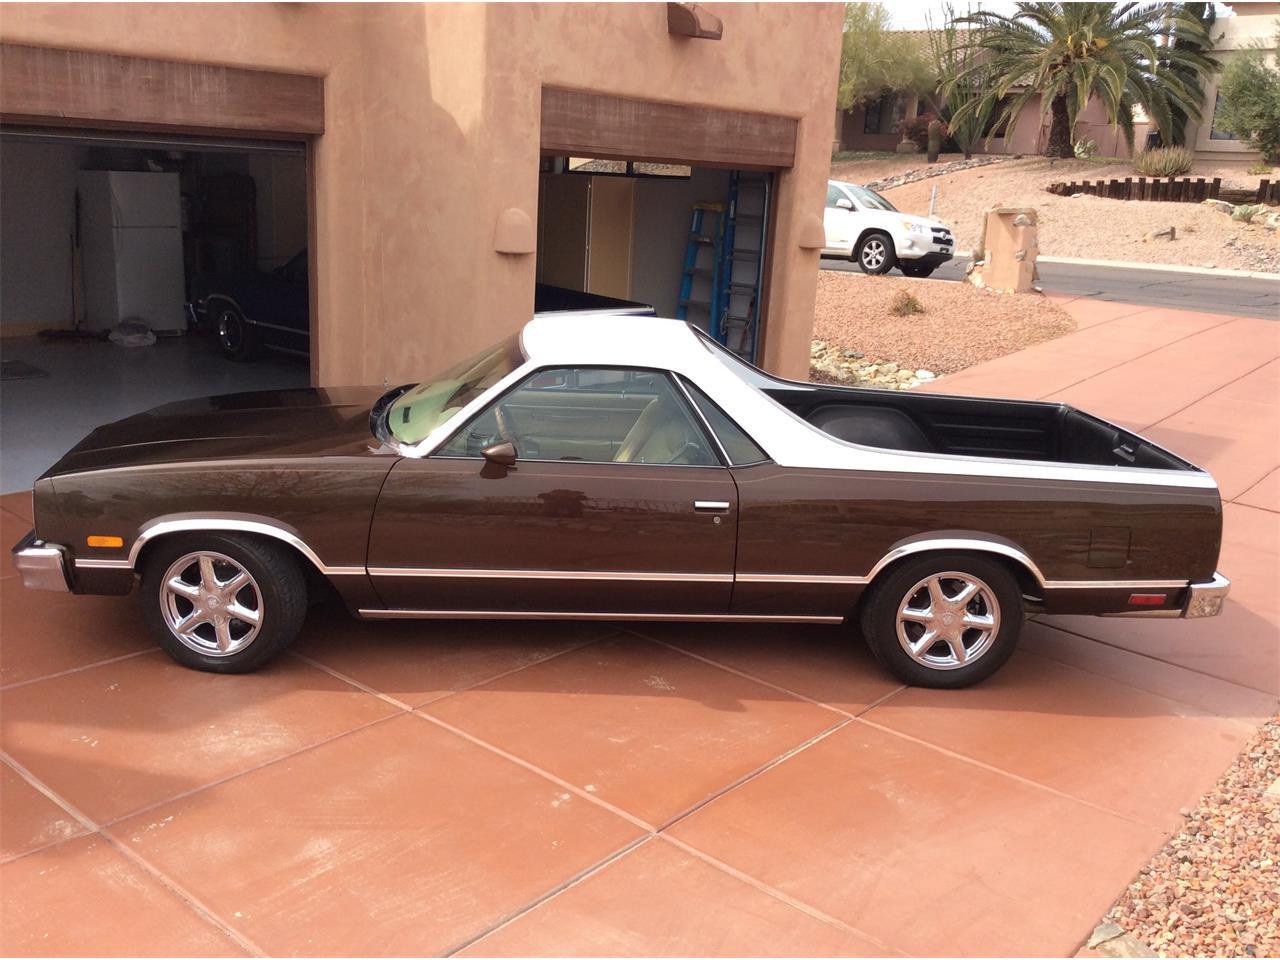 Large Picture of '82 Chevrolet El Camino located in Arizona - $16,500.00 - MPJU